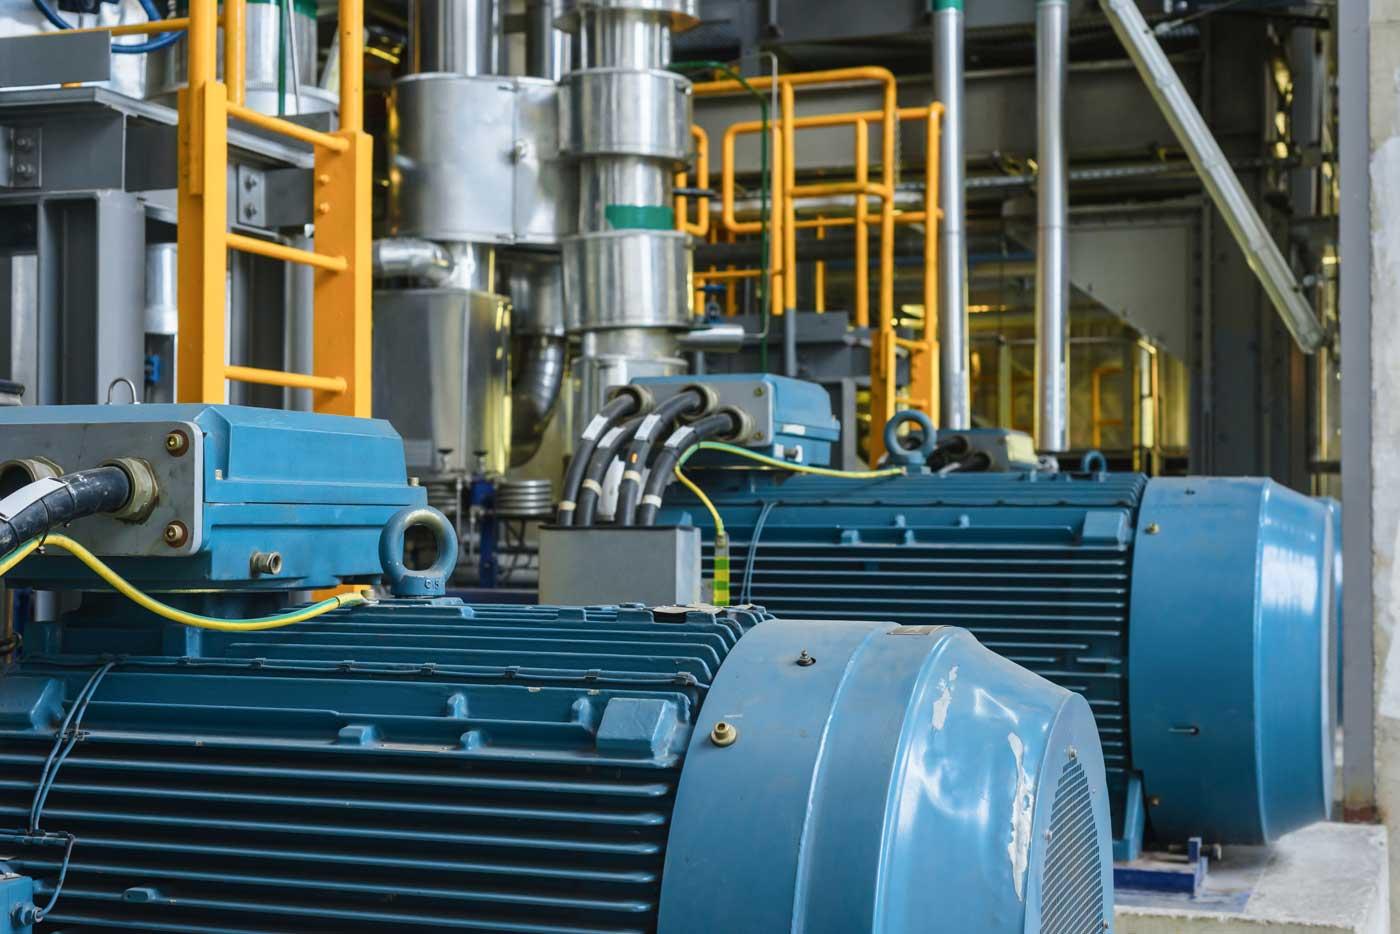 Nuclear steel fabrication